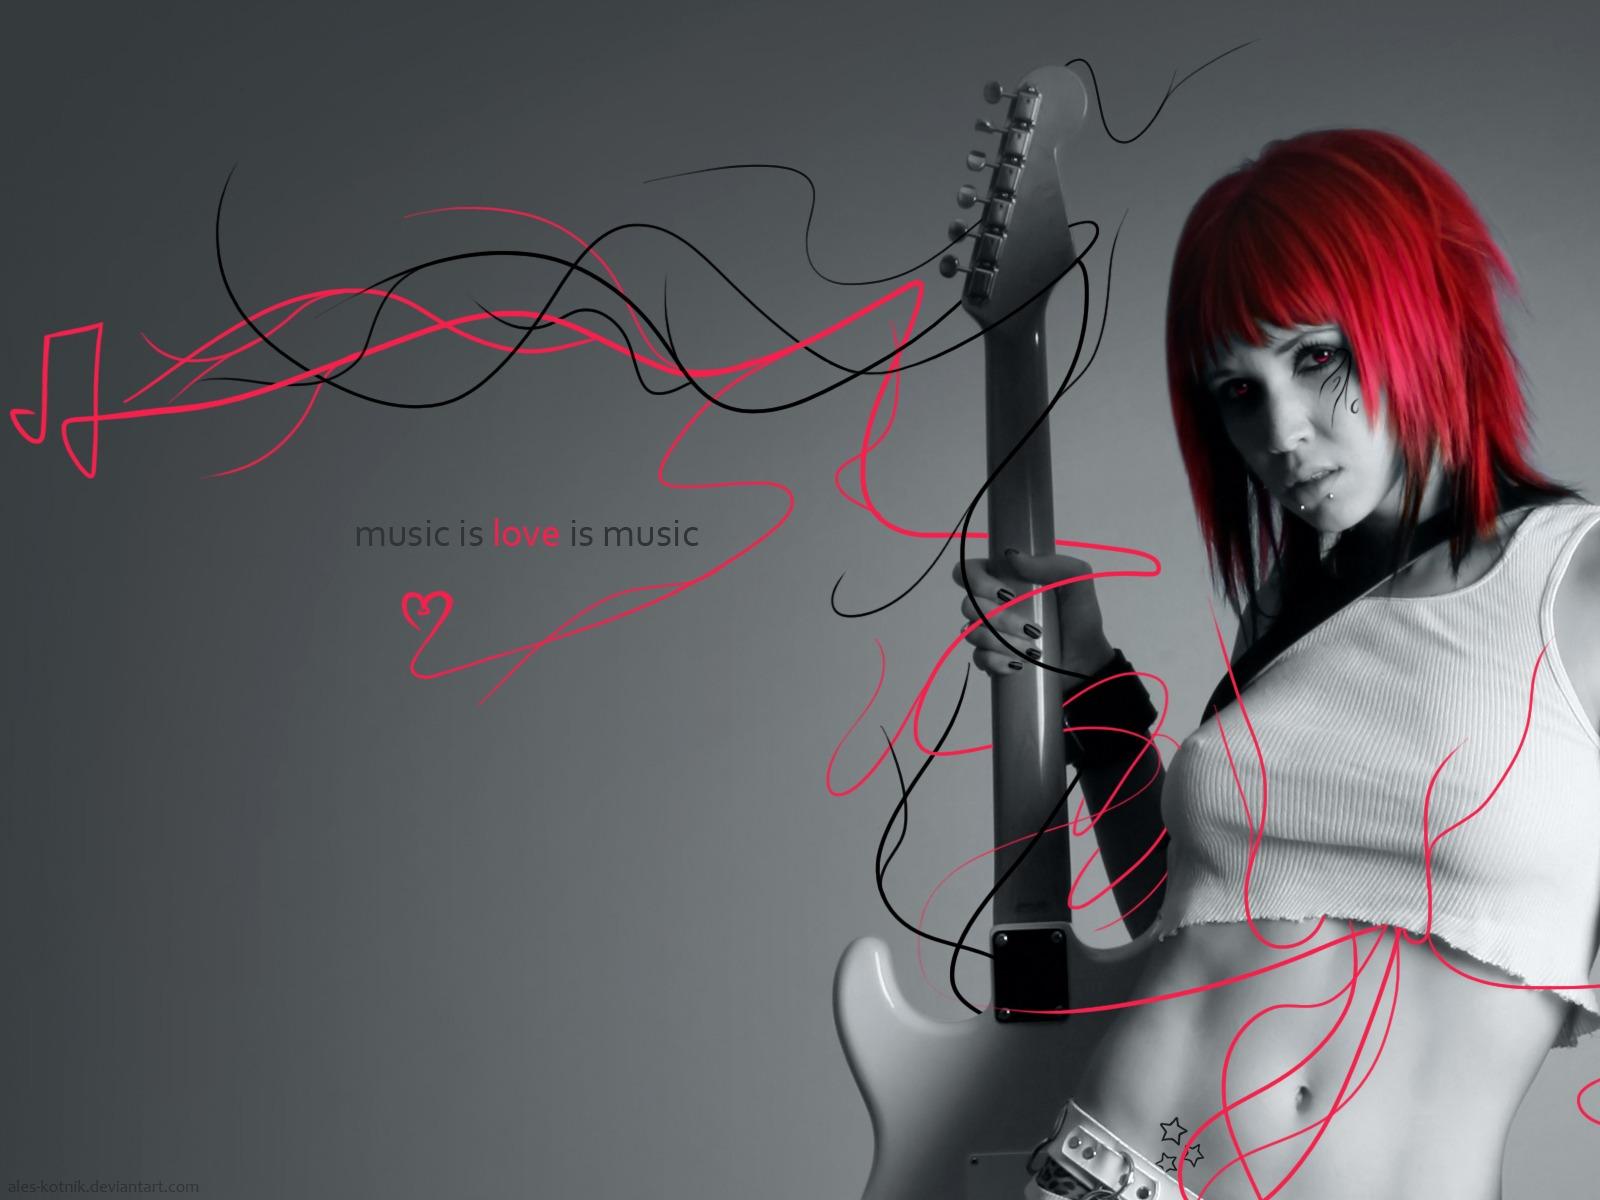 Музика це любов